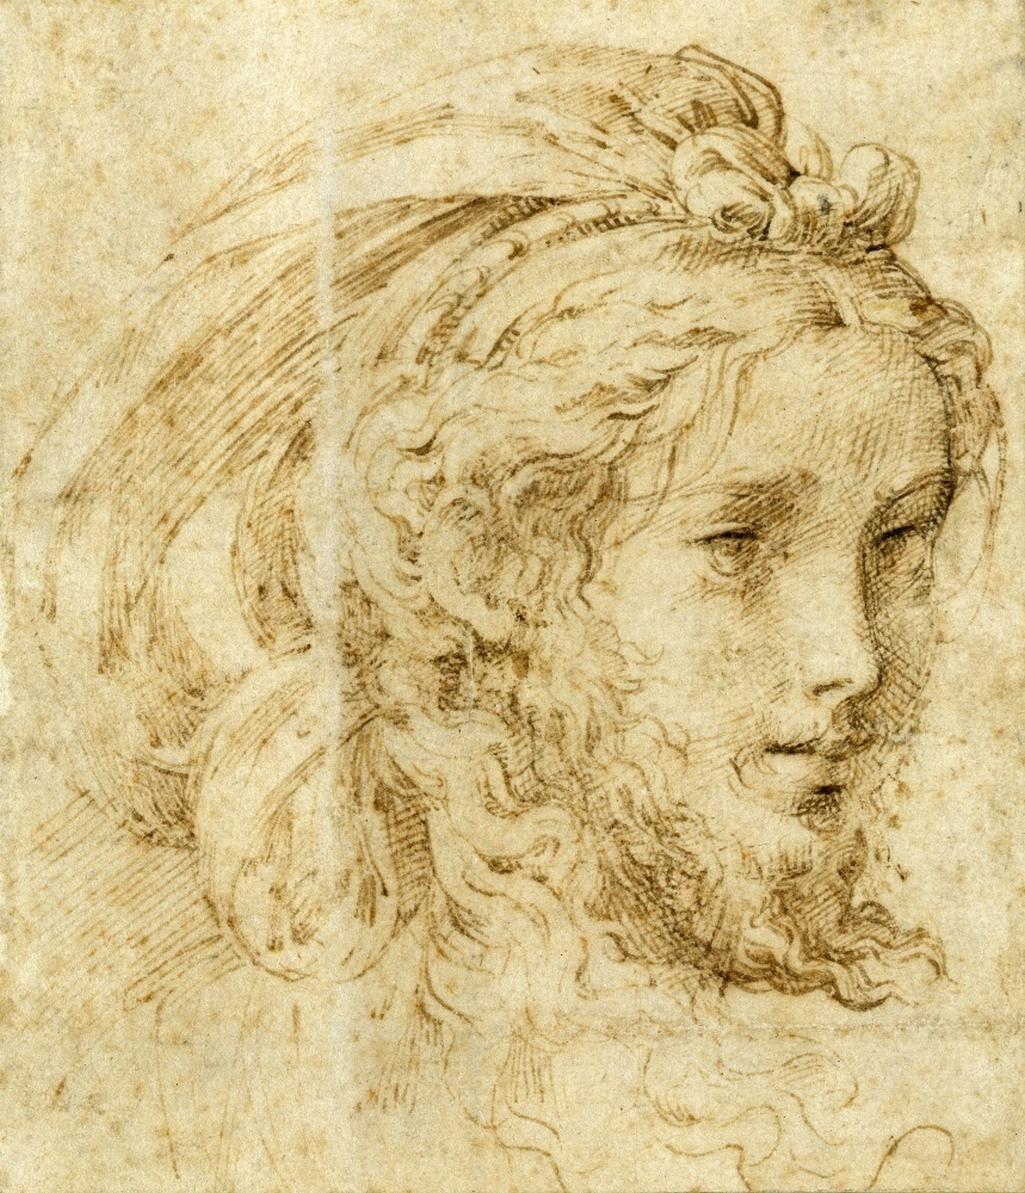 Parmigianino / Portrét mladého muže s vousem